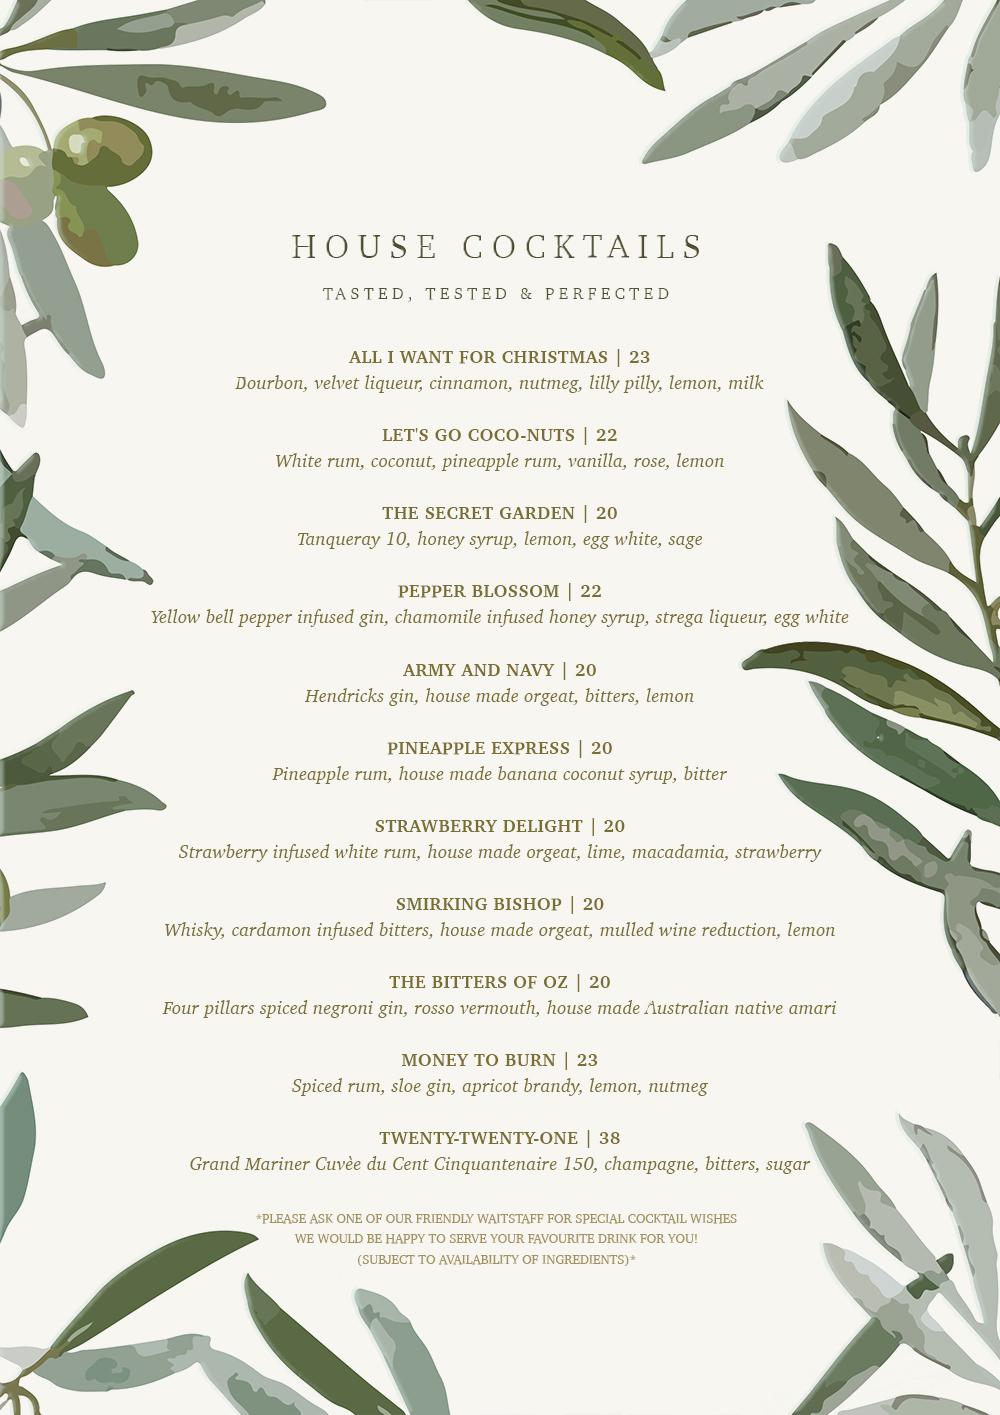 brisbane cocktails venue brisbane cocktail bar